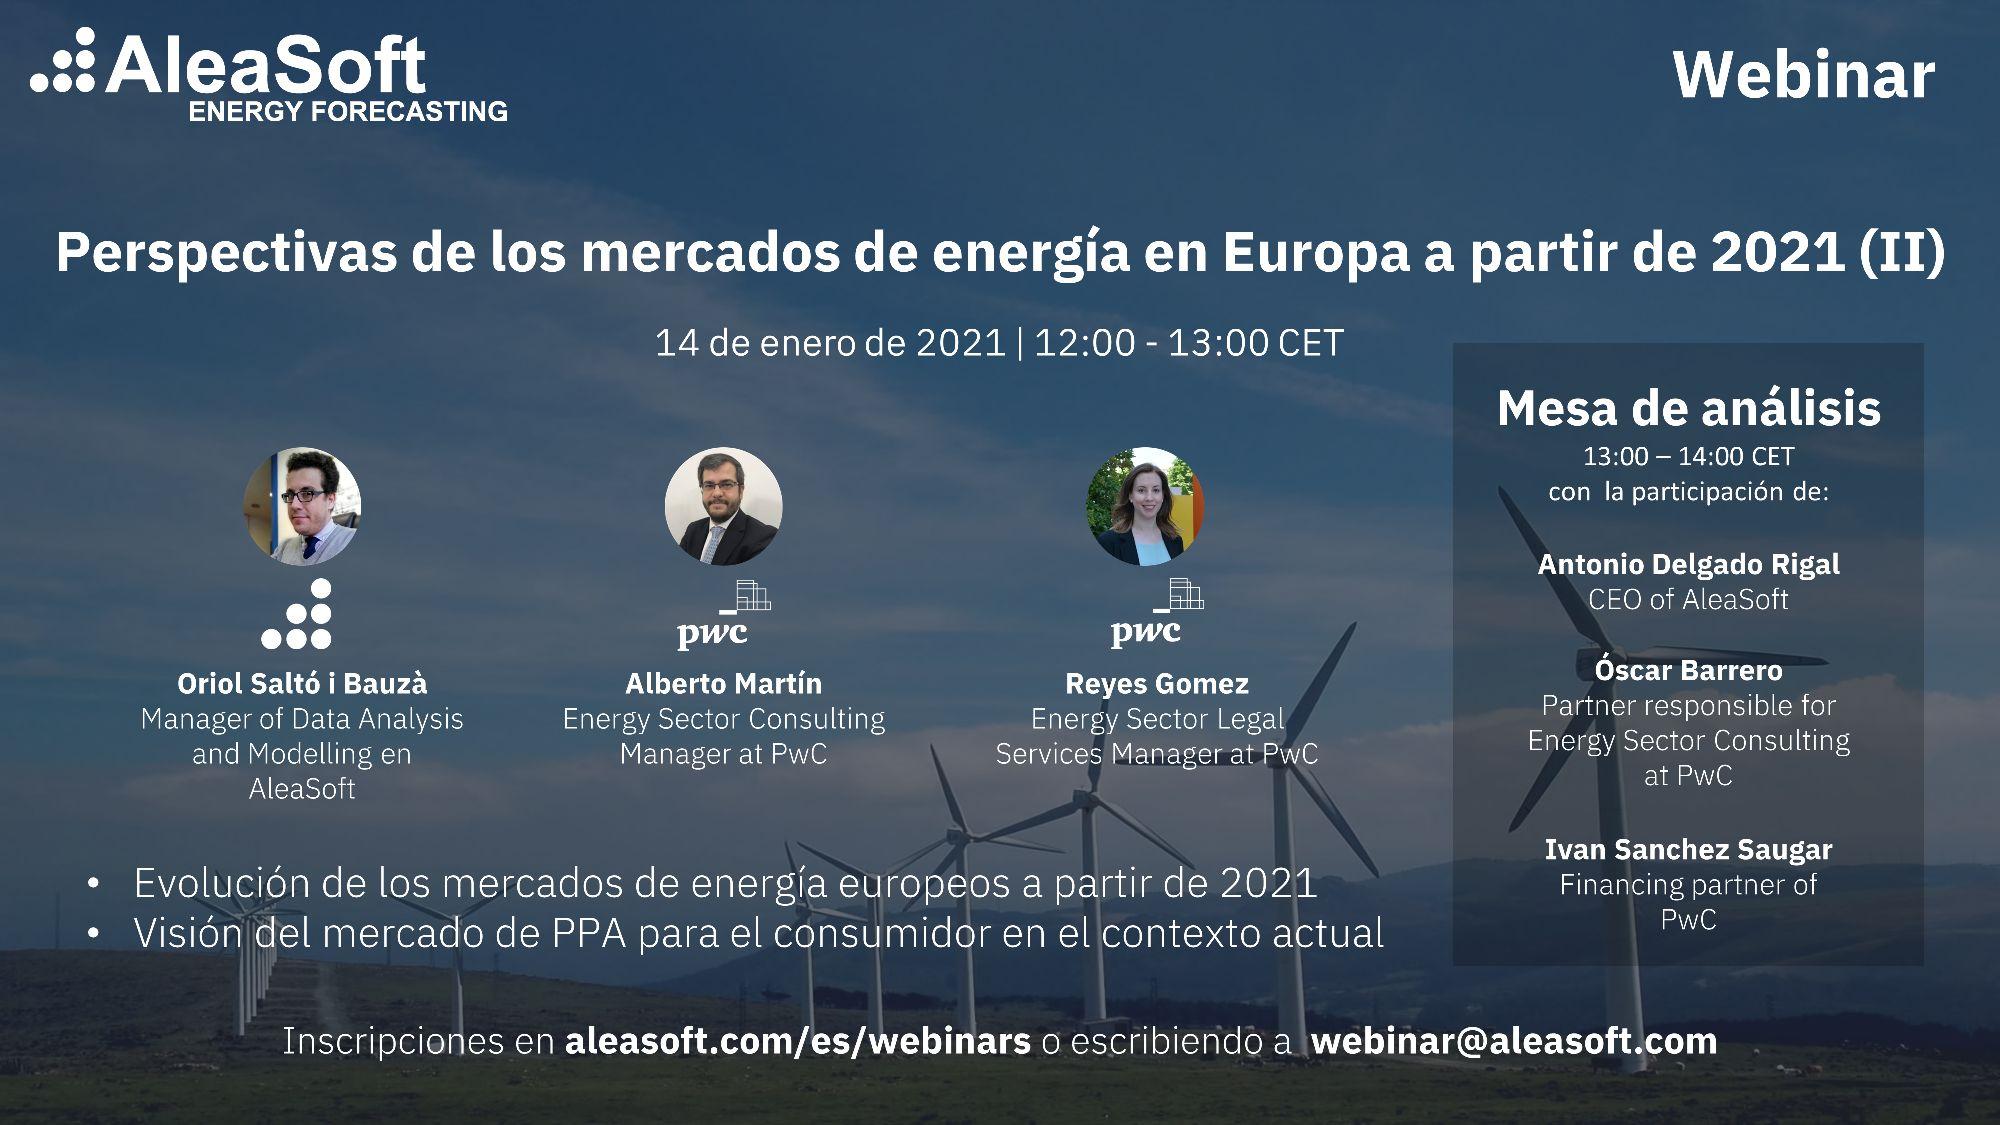 AleaSoft - Webinar Perspectivas mercados energia Europa